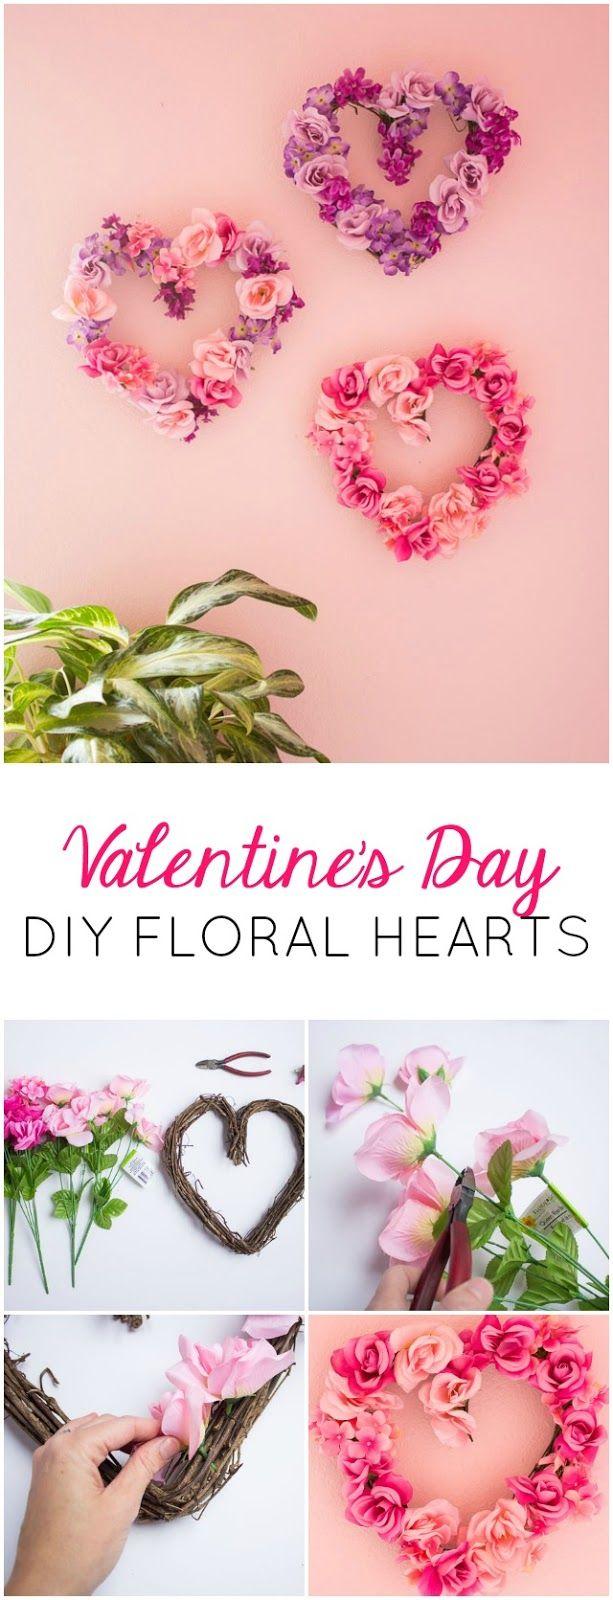 Design Improvised: Valentine's Day Decor: DIY Floral Hearts